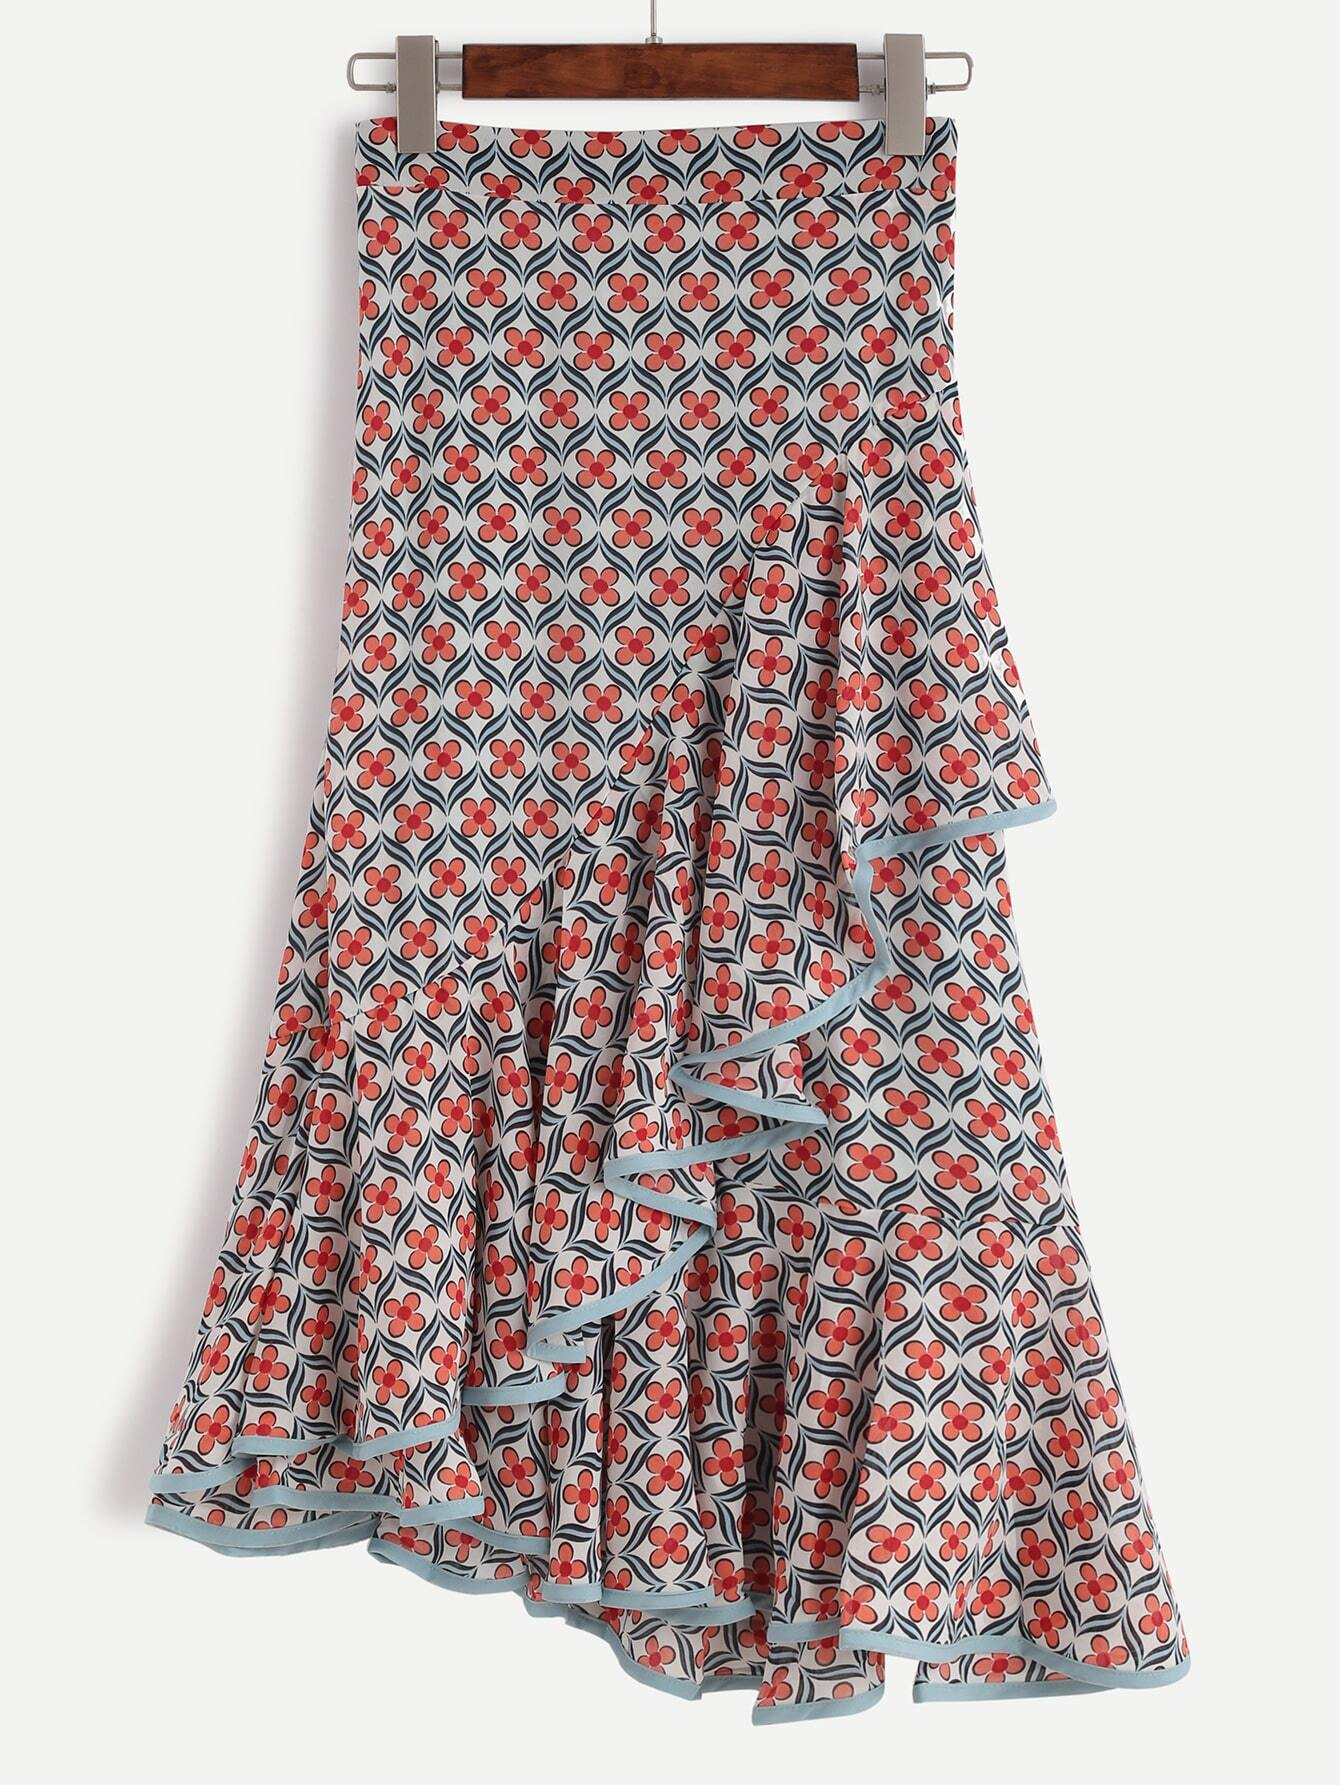 Multi Color Contrast Trim Florals Ruffle Chiffon Skirt skirt161011491